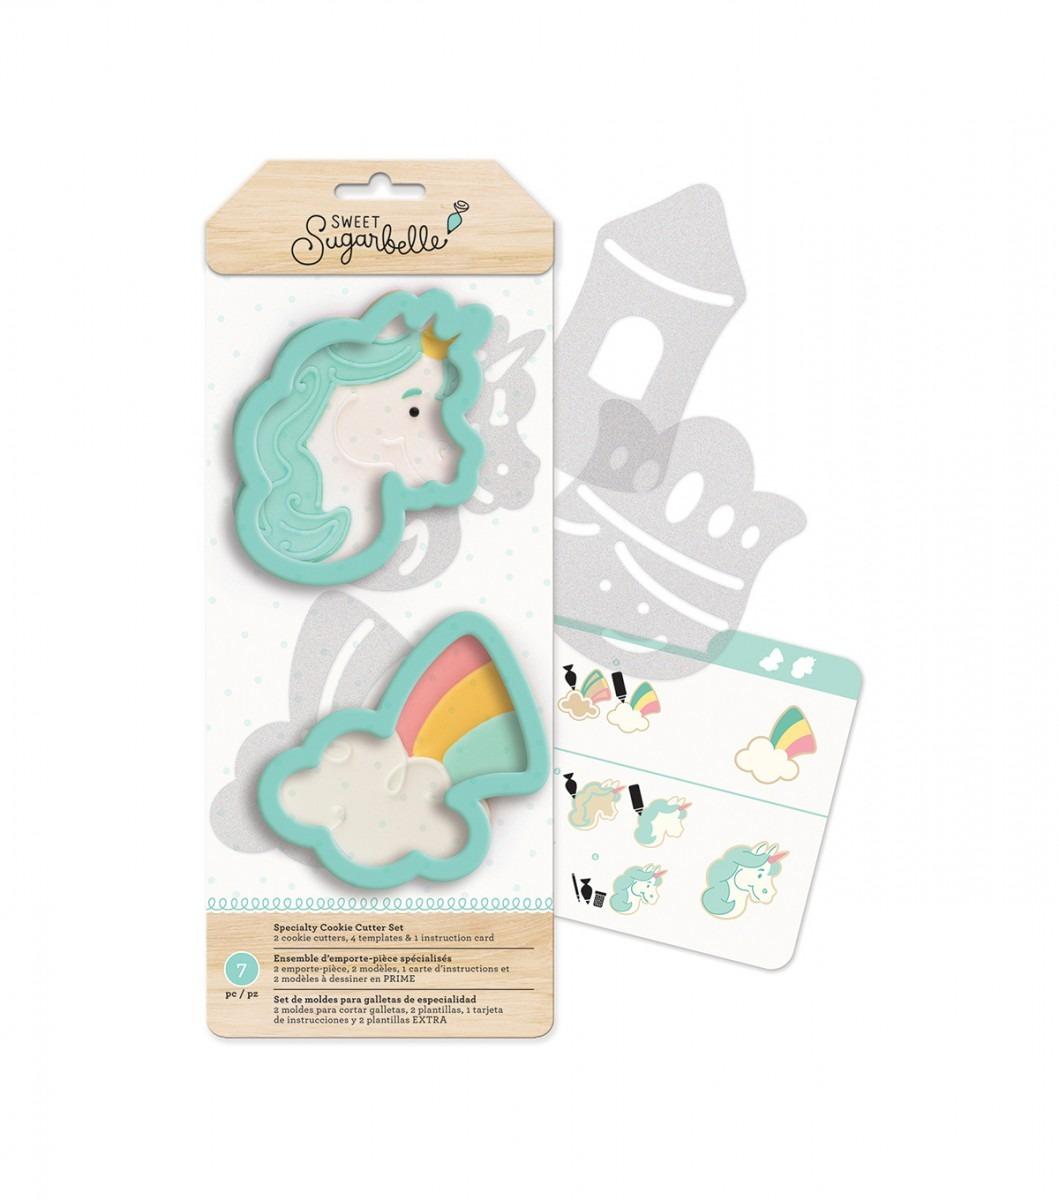 Sweet Sugarbelle Cookie Cutters Enchanted